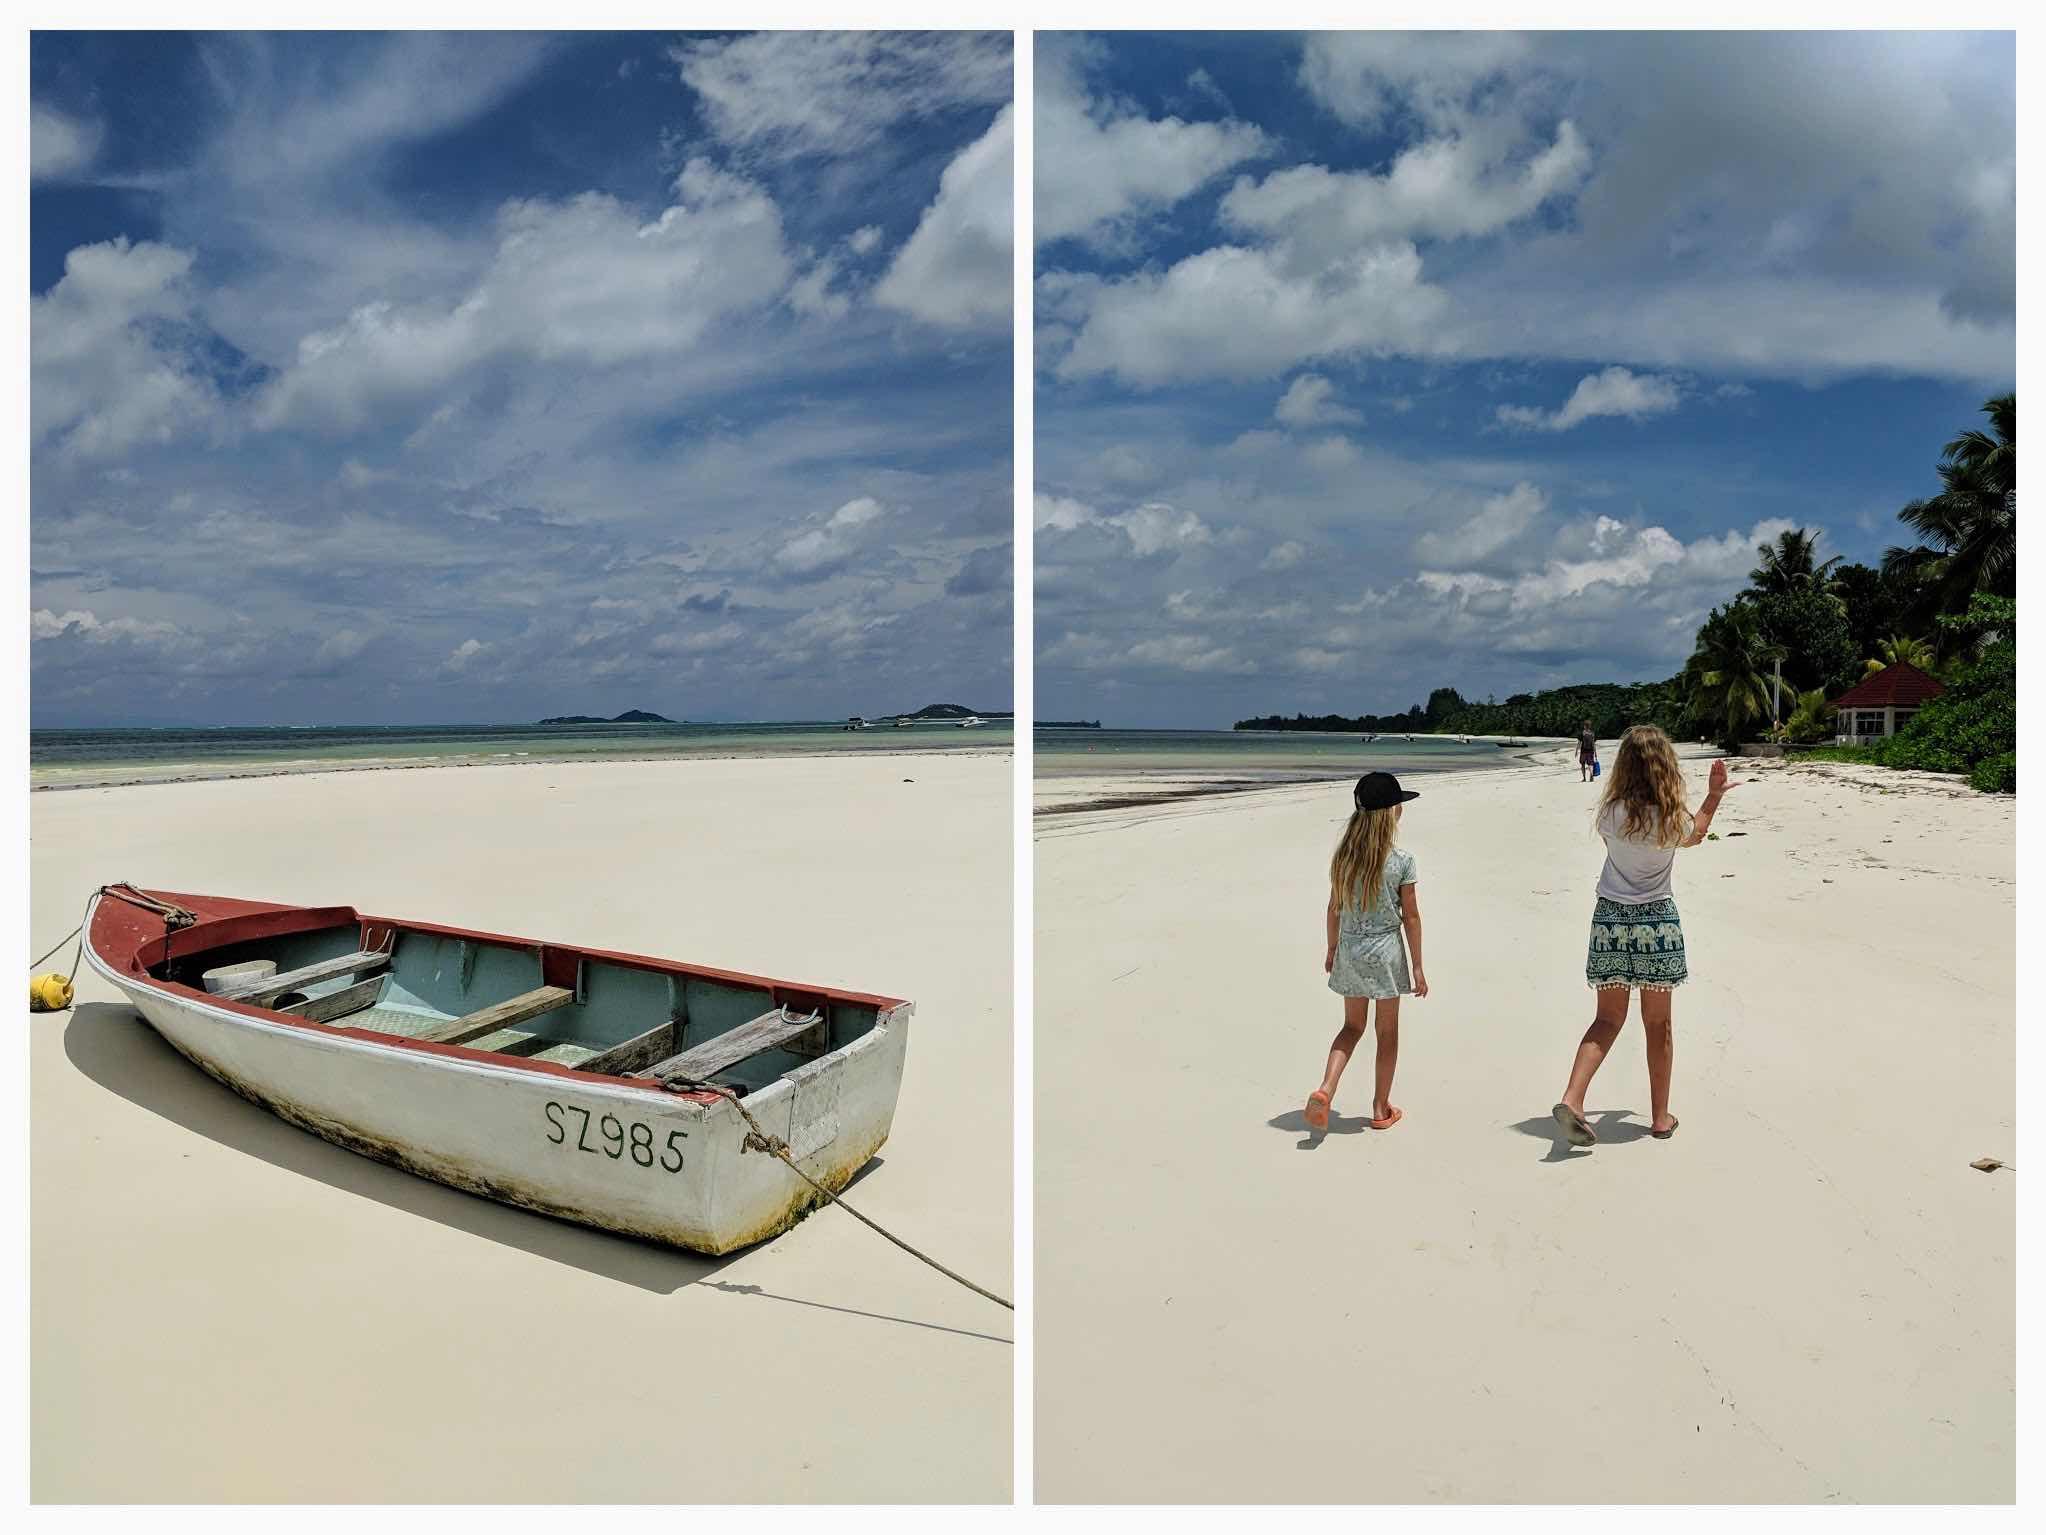 Grande Anse Praslin